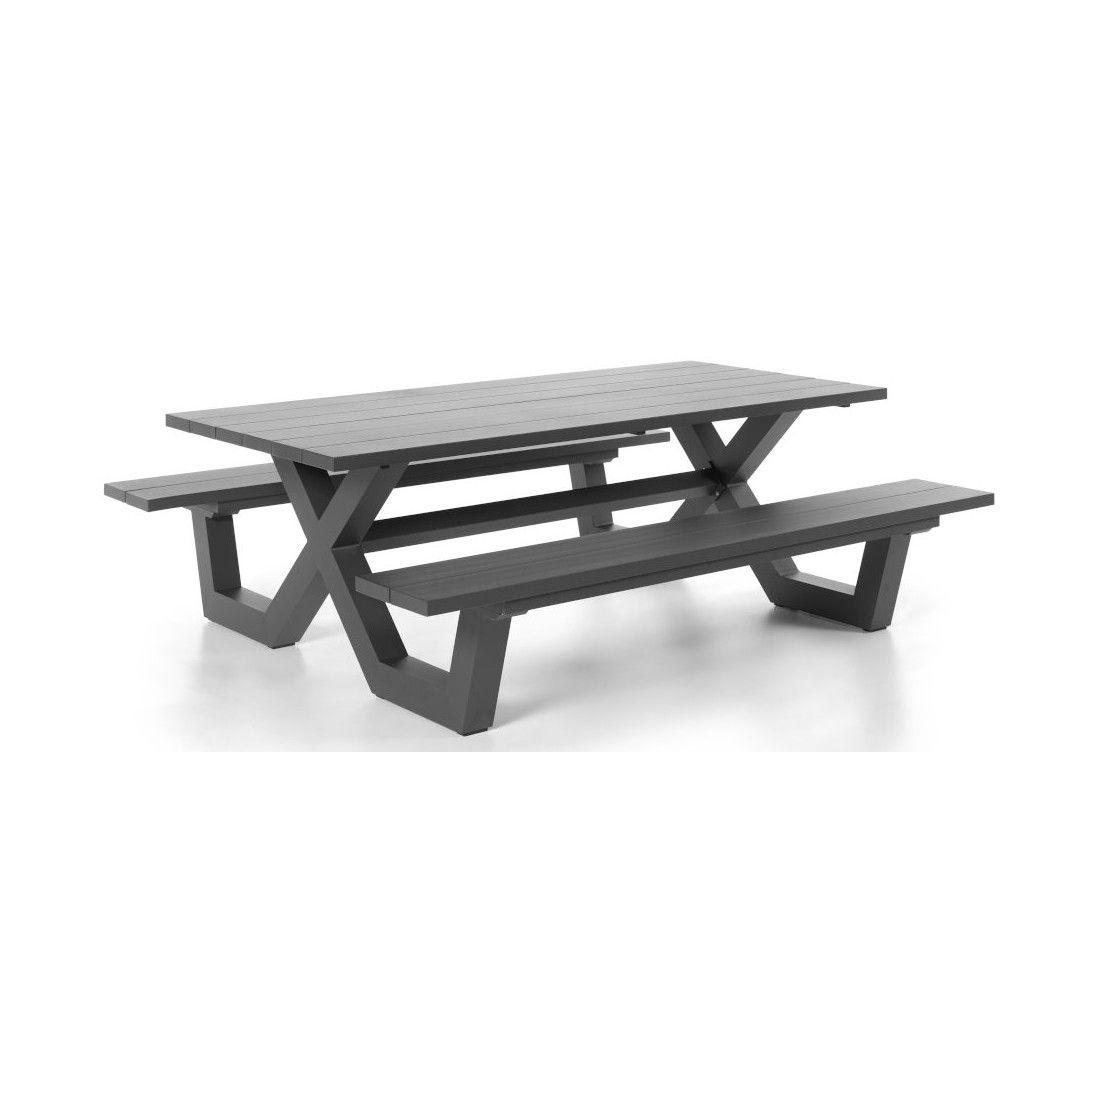 Table picnic en aluminium blanc ou charcoal 220 cm, Bonucci